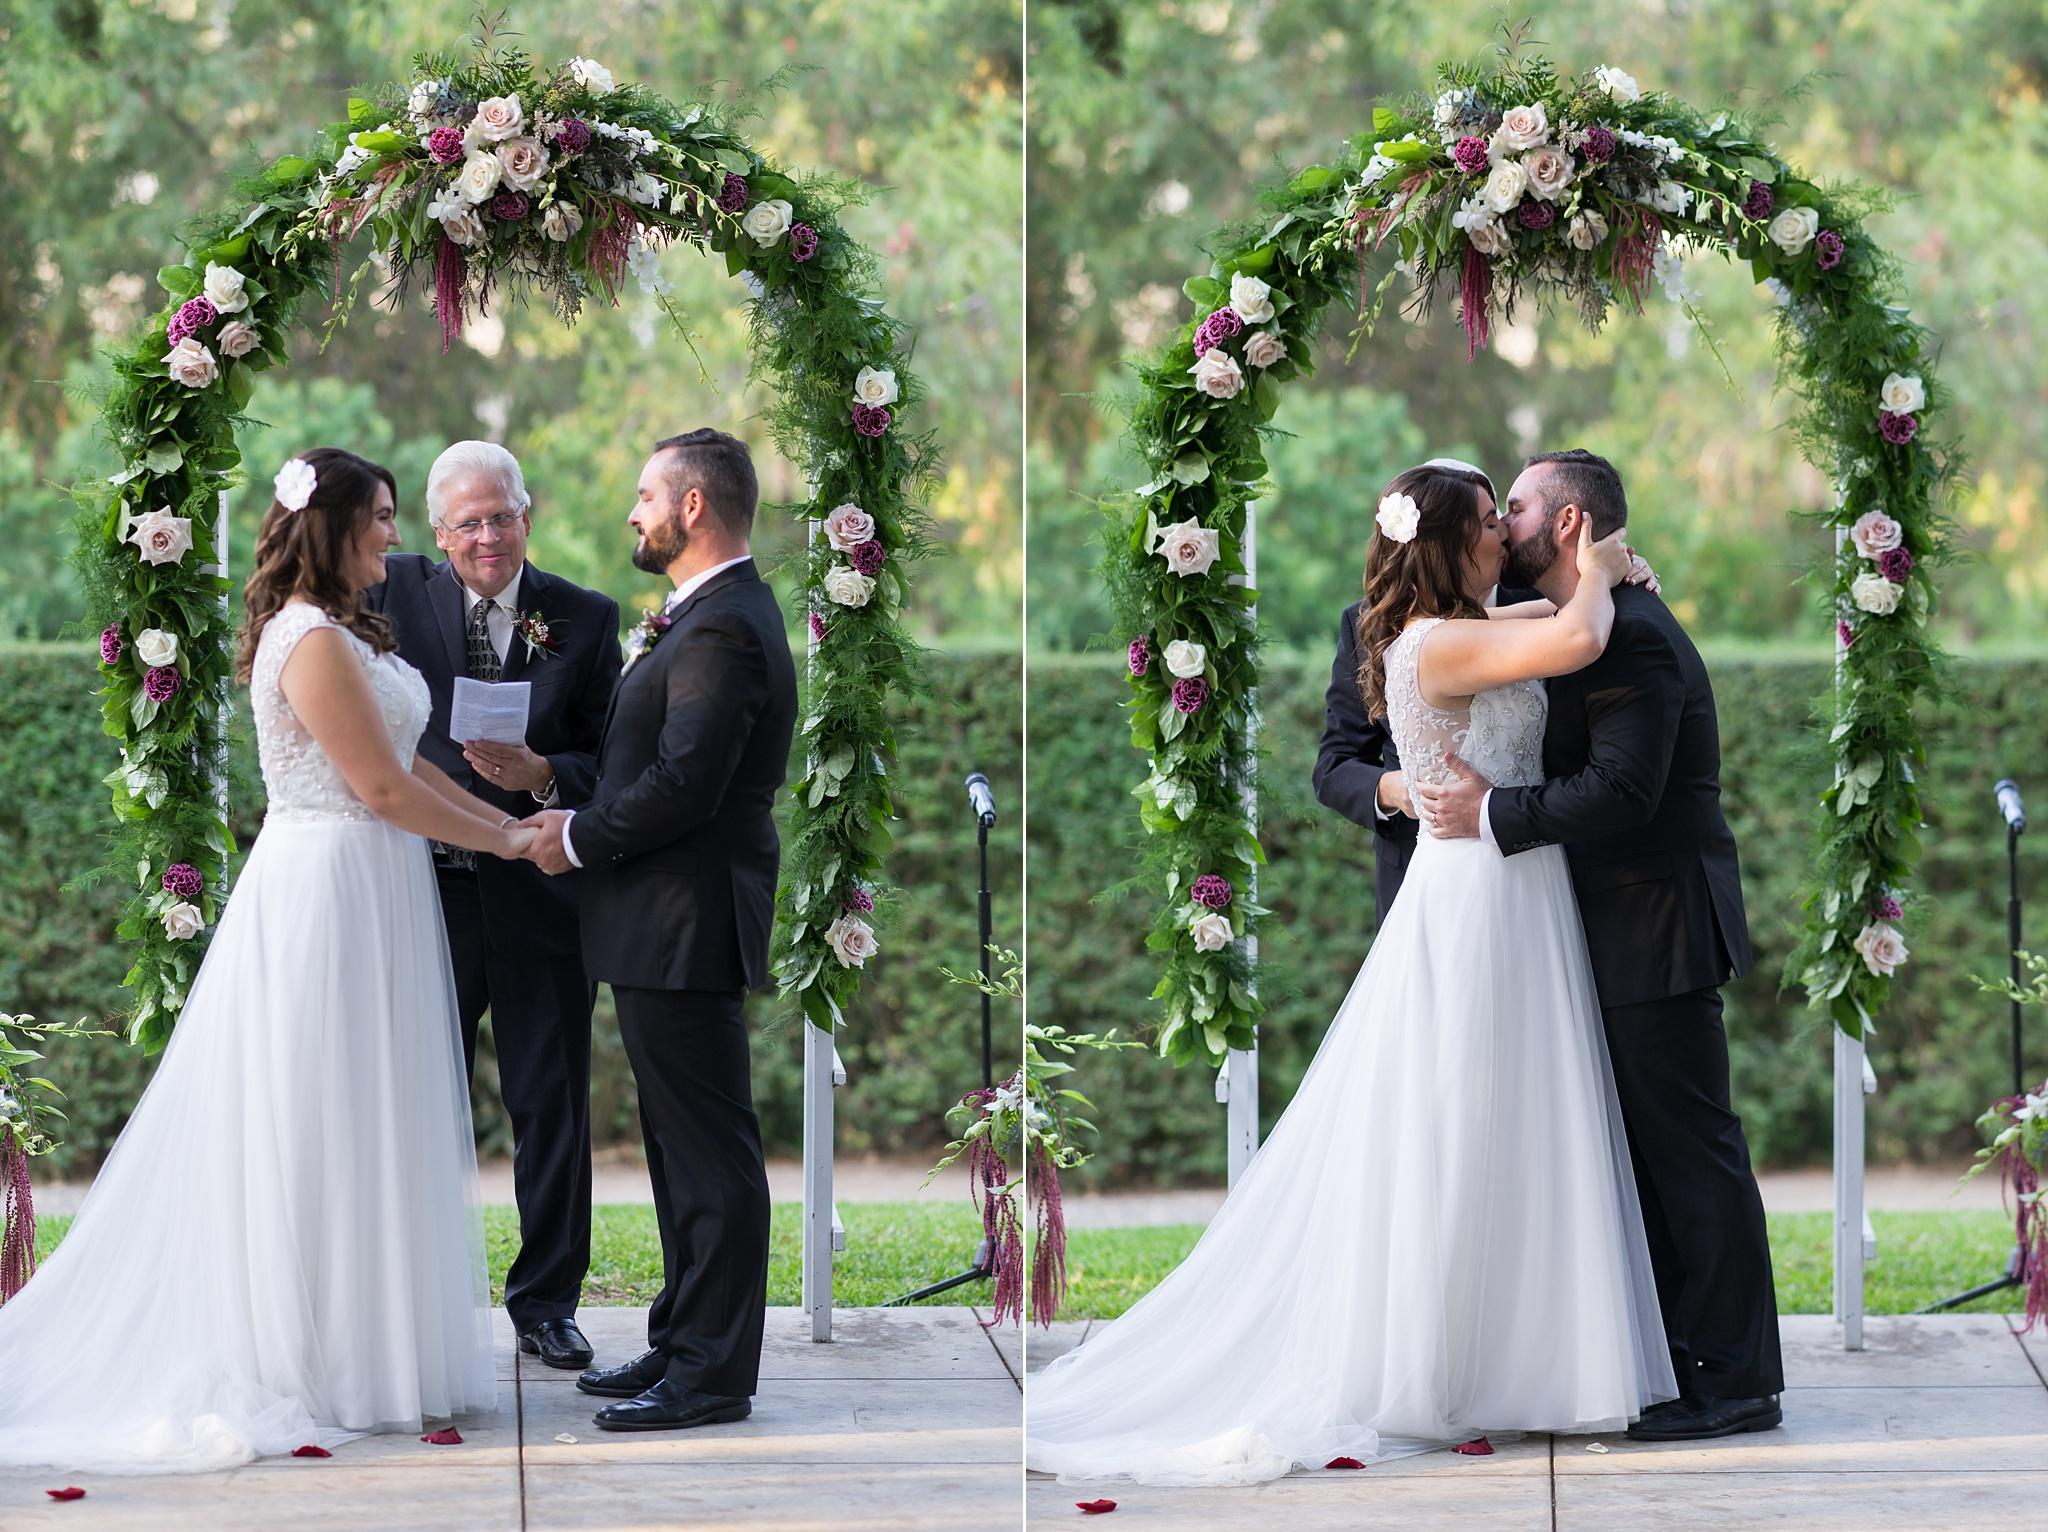 TommyandAmanda_WEDDING_BrienneMichelle_Ceremony_084_BLOG.jpg